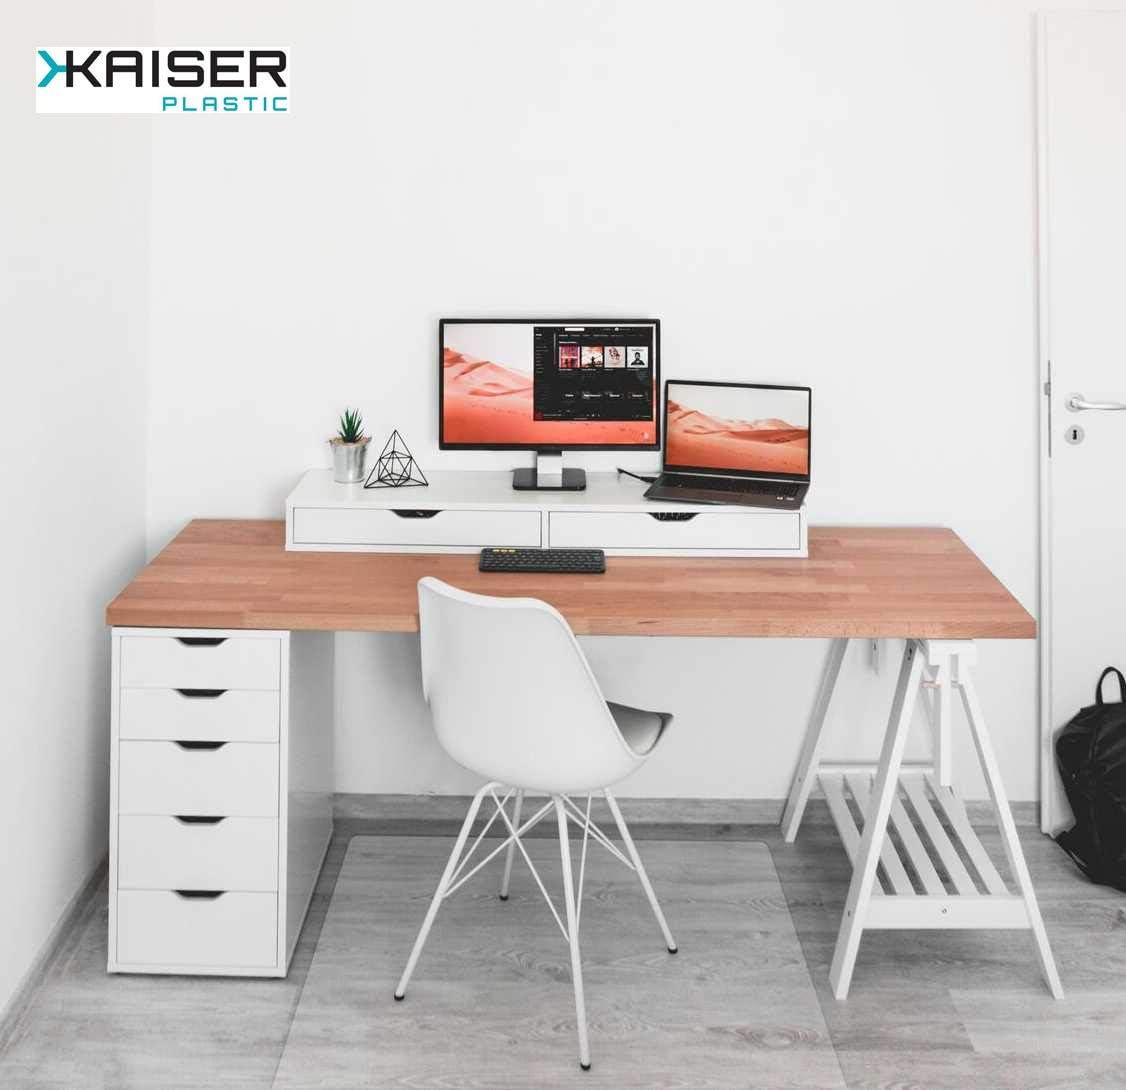 90 x 120 cm KAISER PLASTIC/® Xtra Strong Made-In-Germany Hartboden Bodenschutzmatte